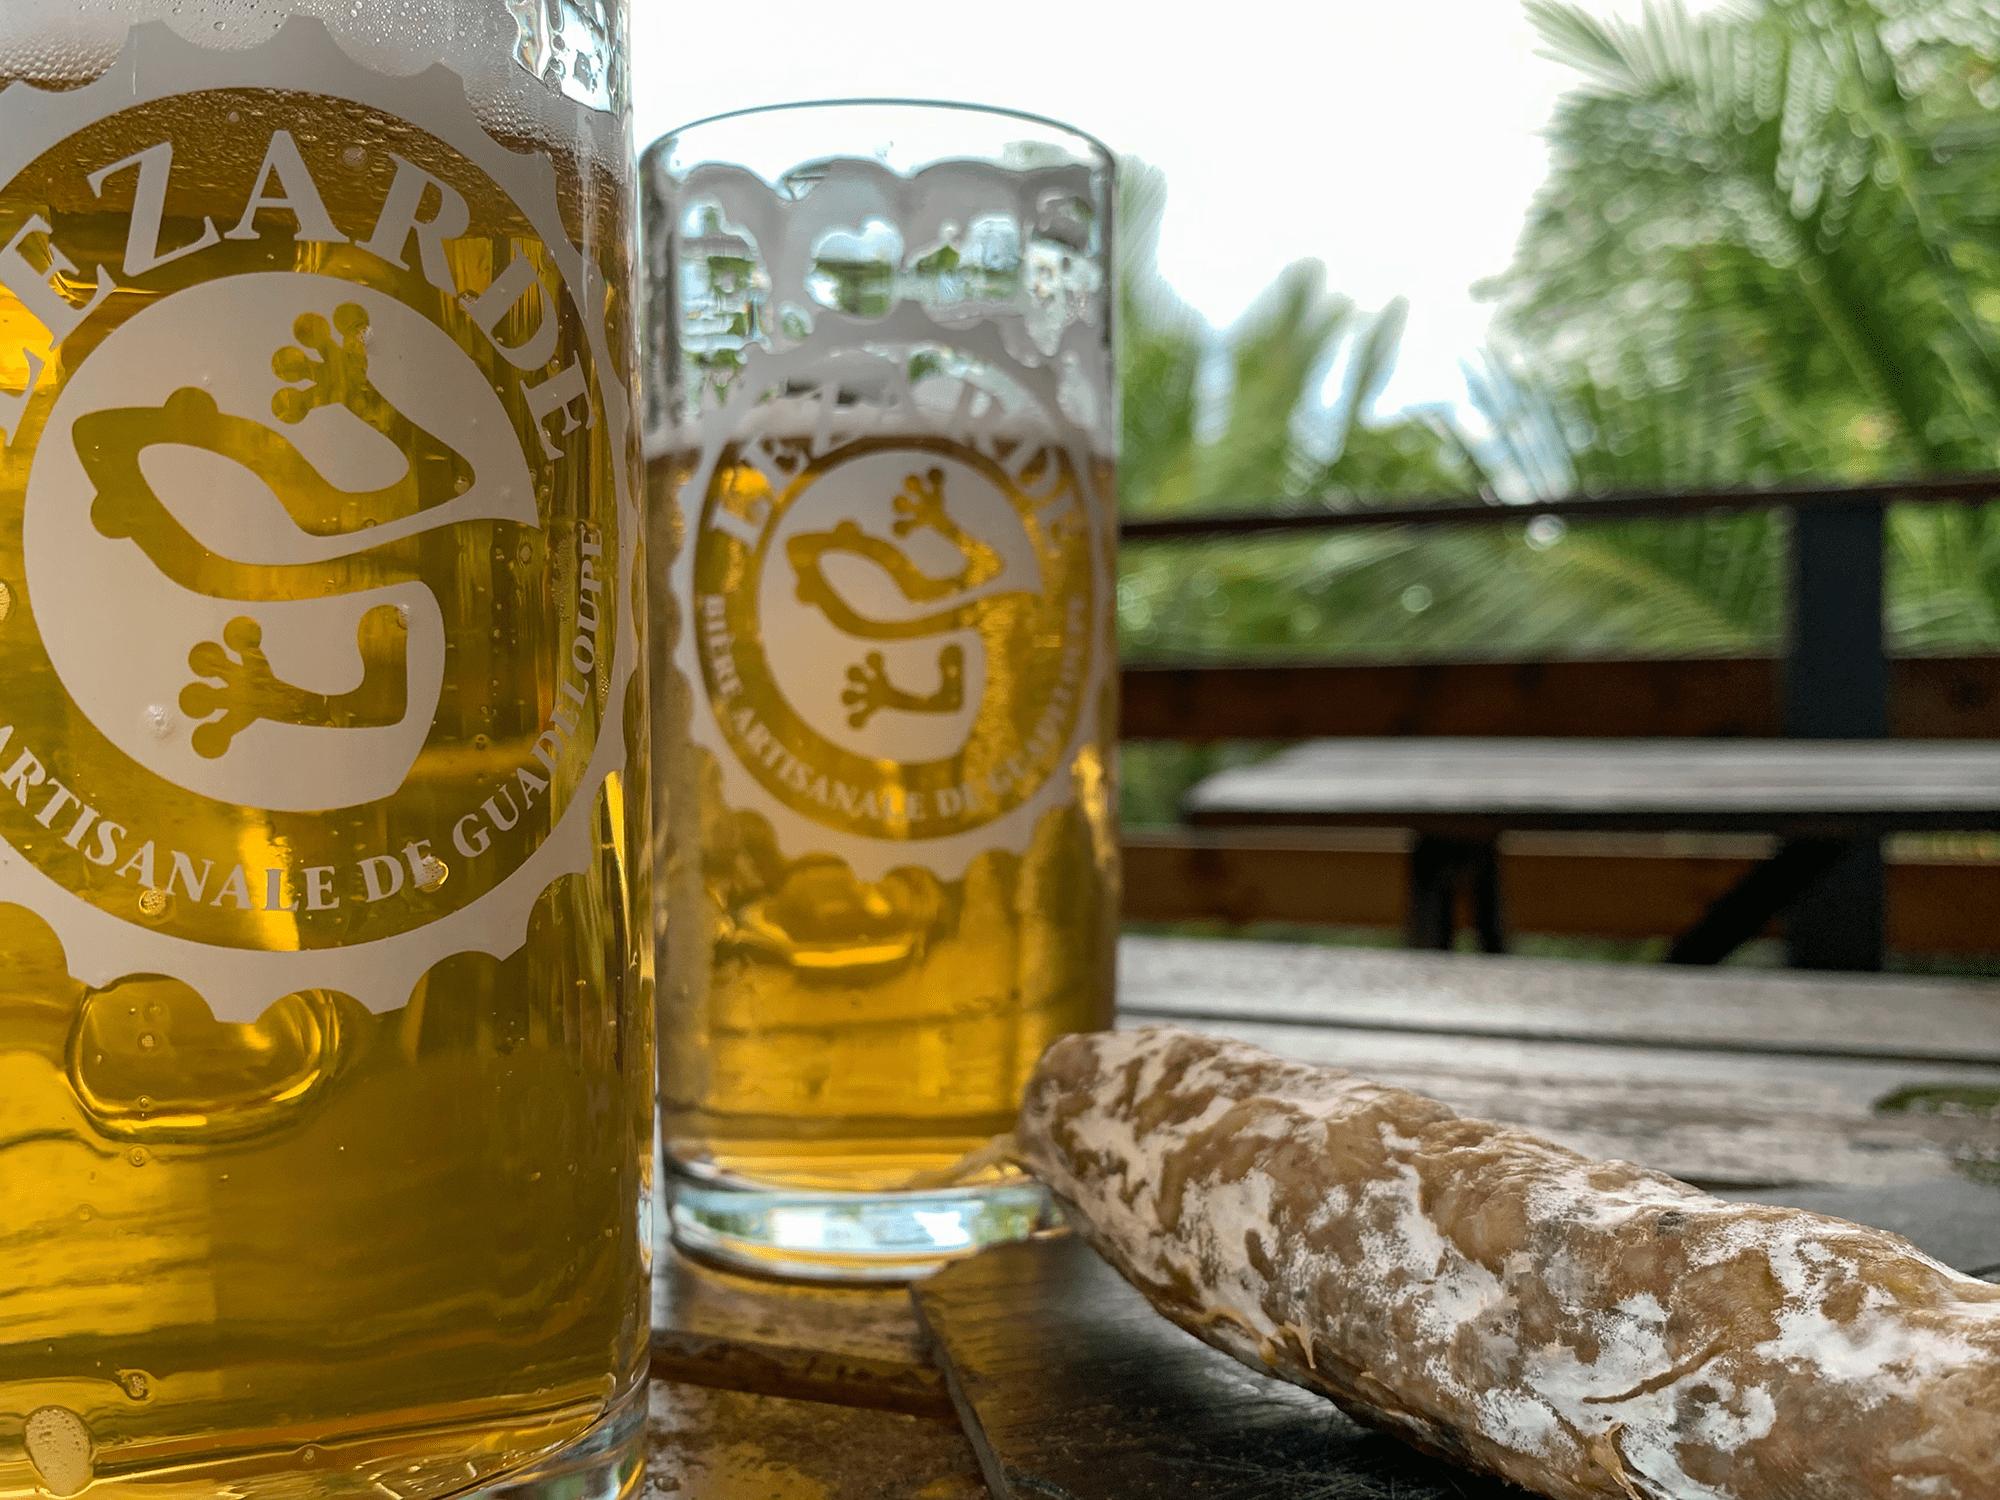 brasserie-la-lezarde-basse-terre-guadeloupe